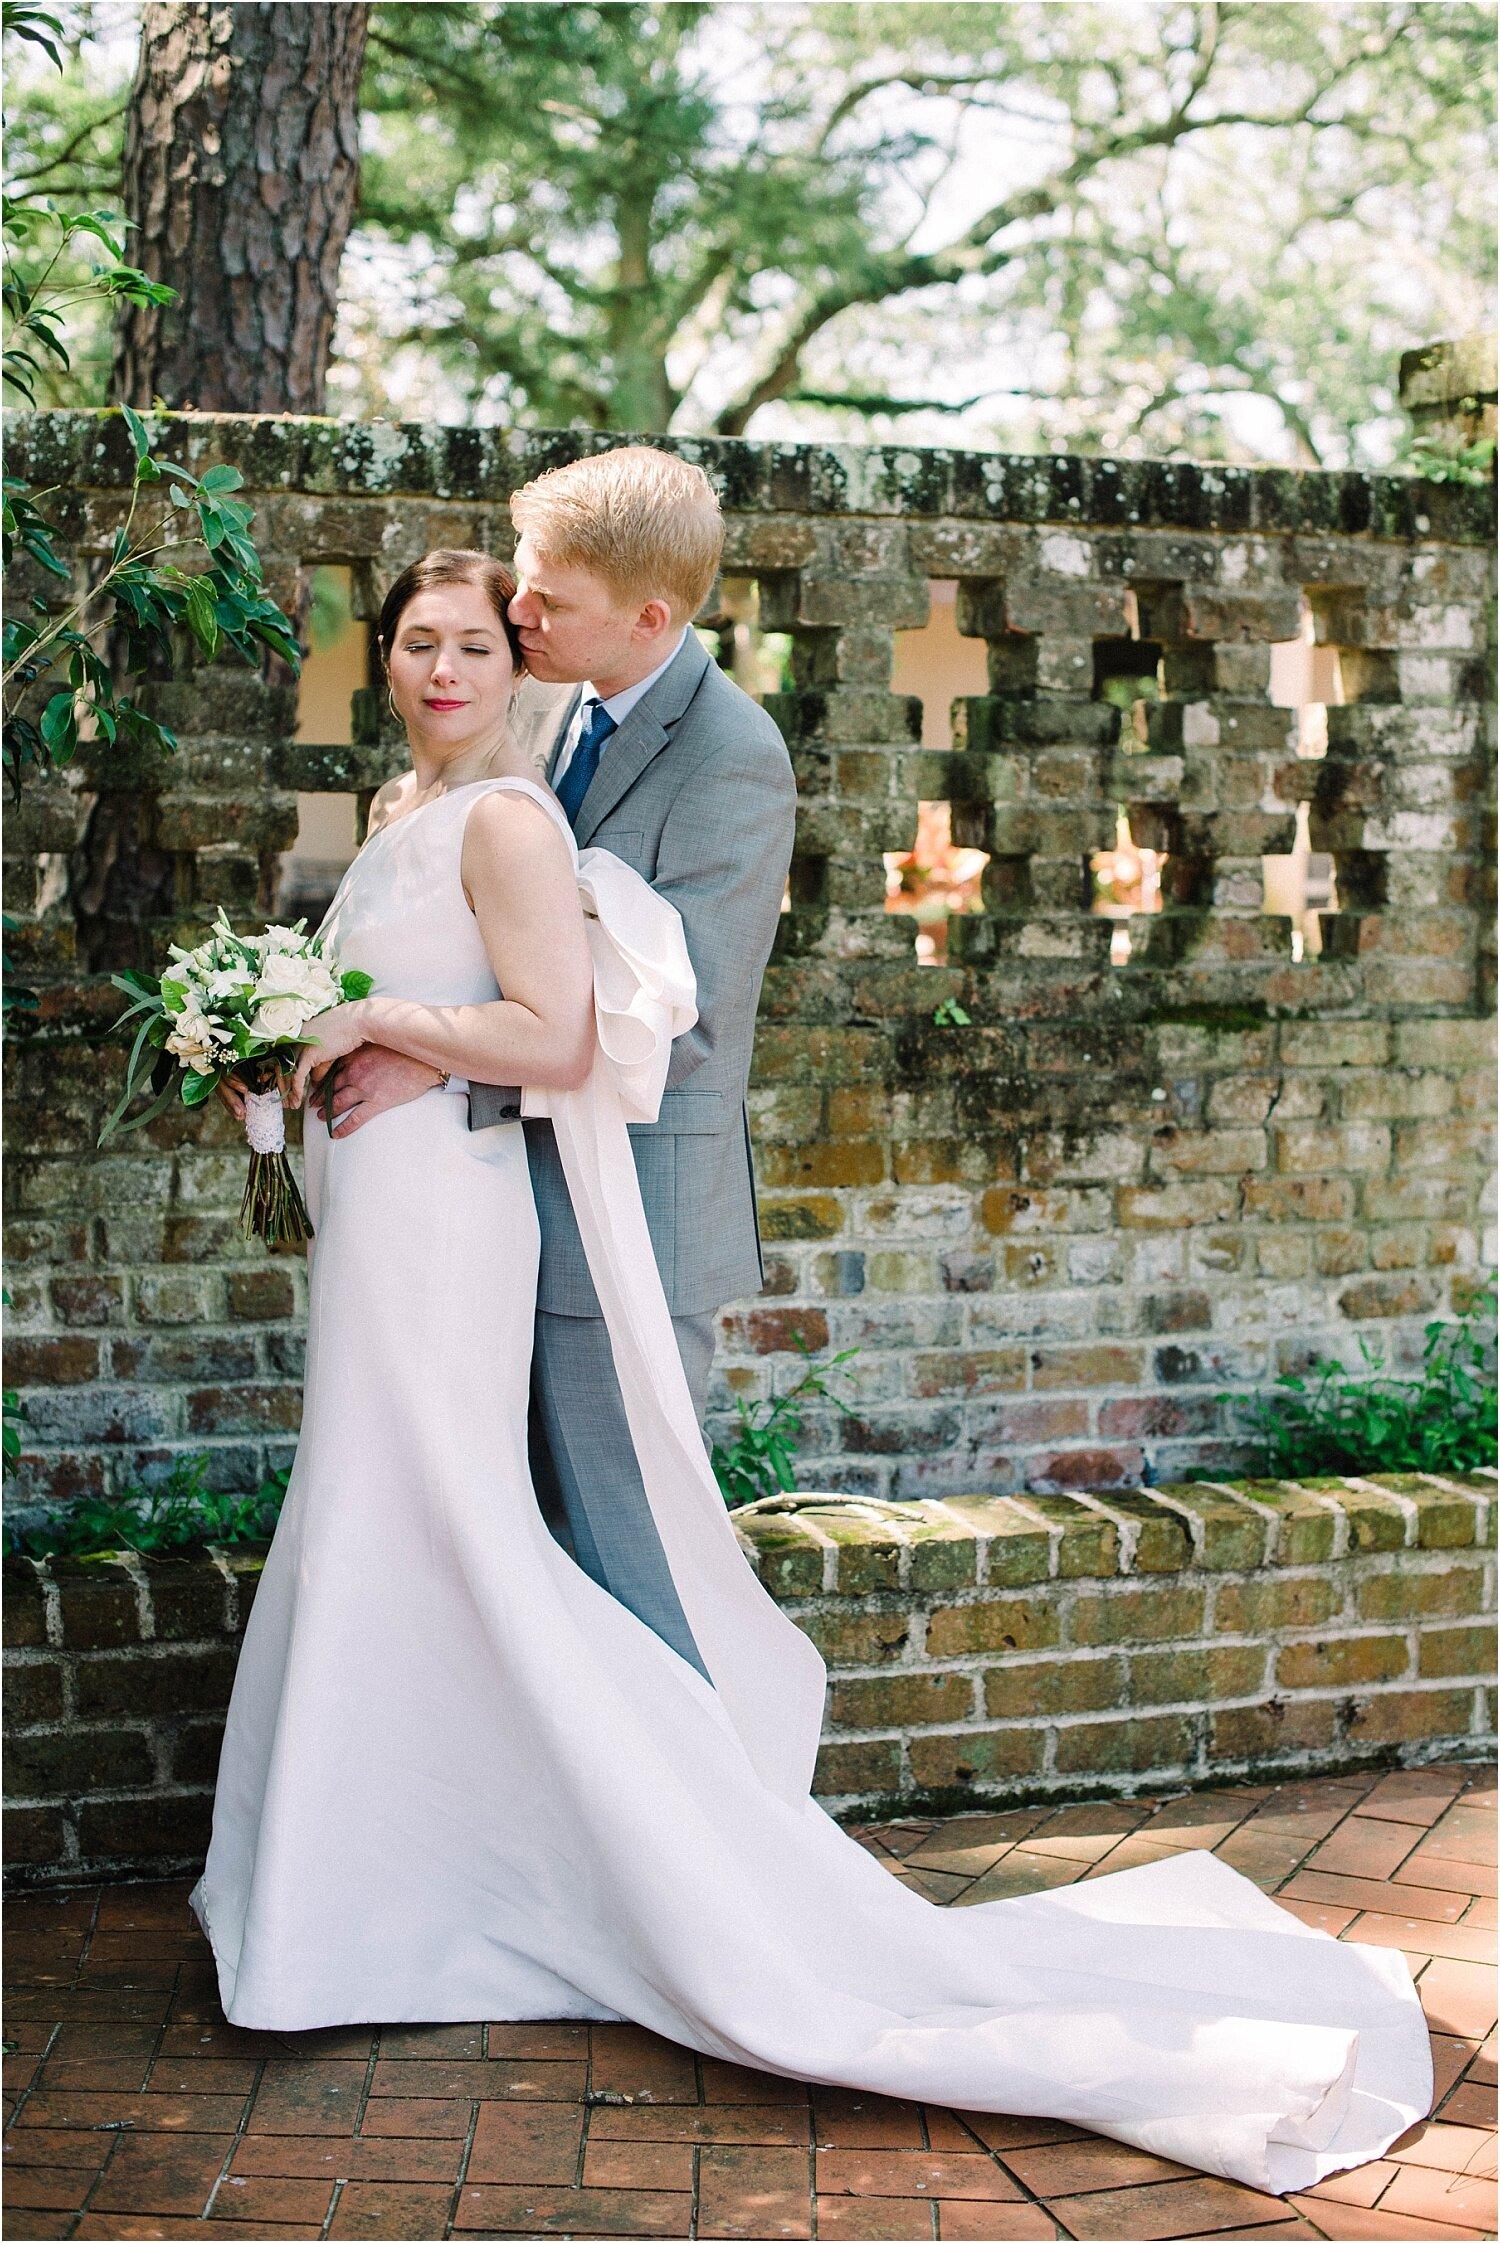 Heather + Scott-Longue-Vue-house-and-gardens-black-tie-wedding-photos_Gabby Chapin_Print_0083_BLOG.jpg